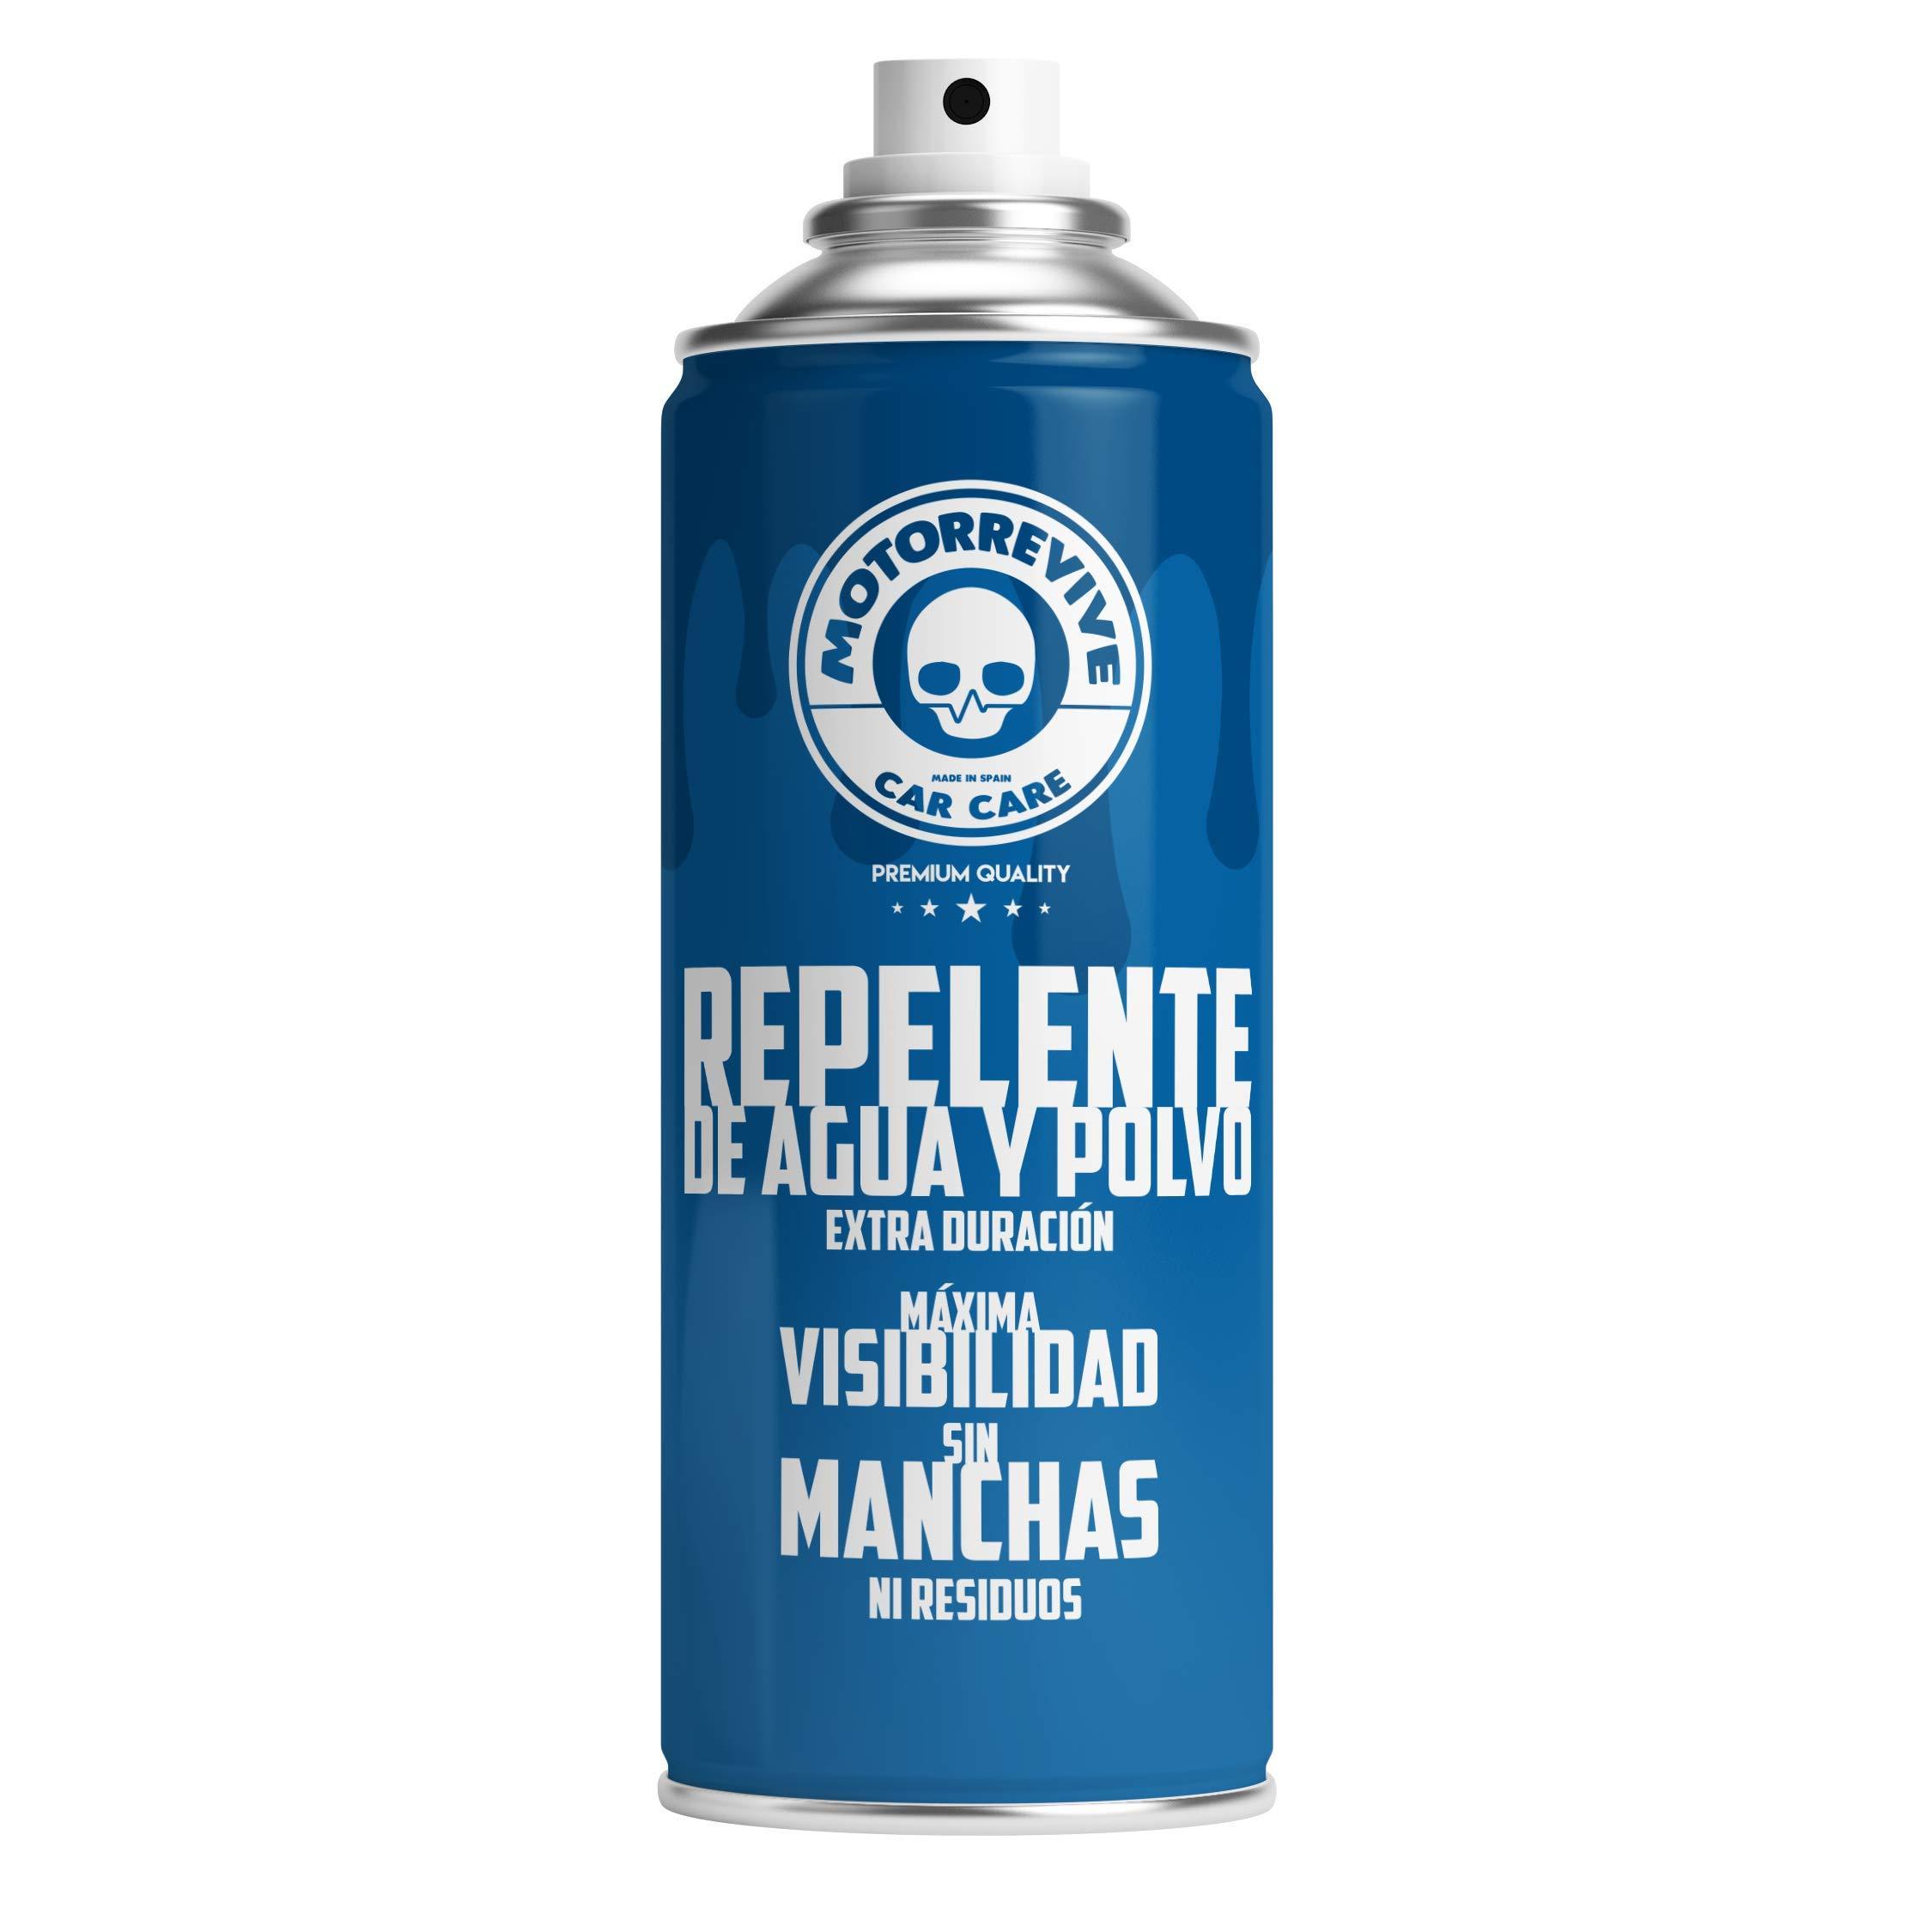 MOTORREVIVE CAR CARE 8437015902036 Repelente Agua y Polvo para Coche Azul 400 ml product image